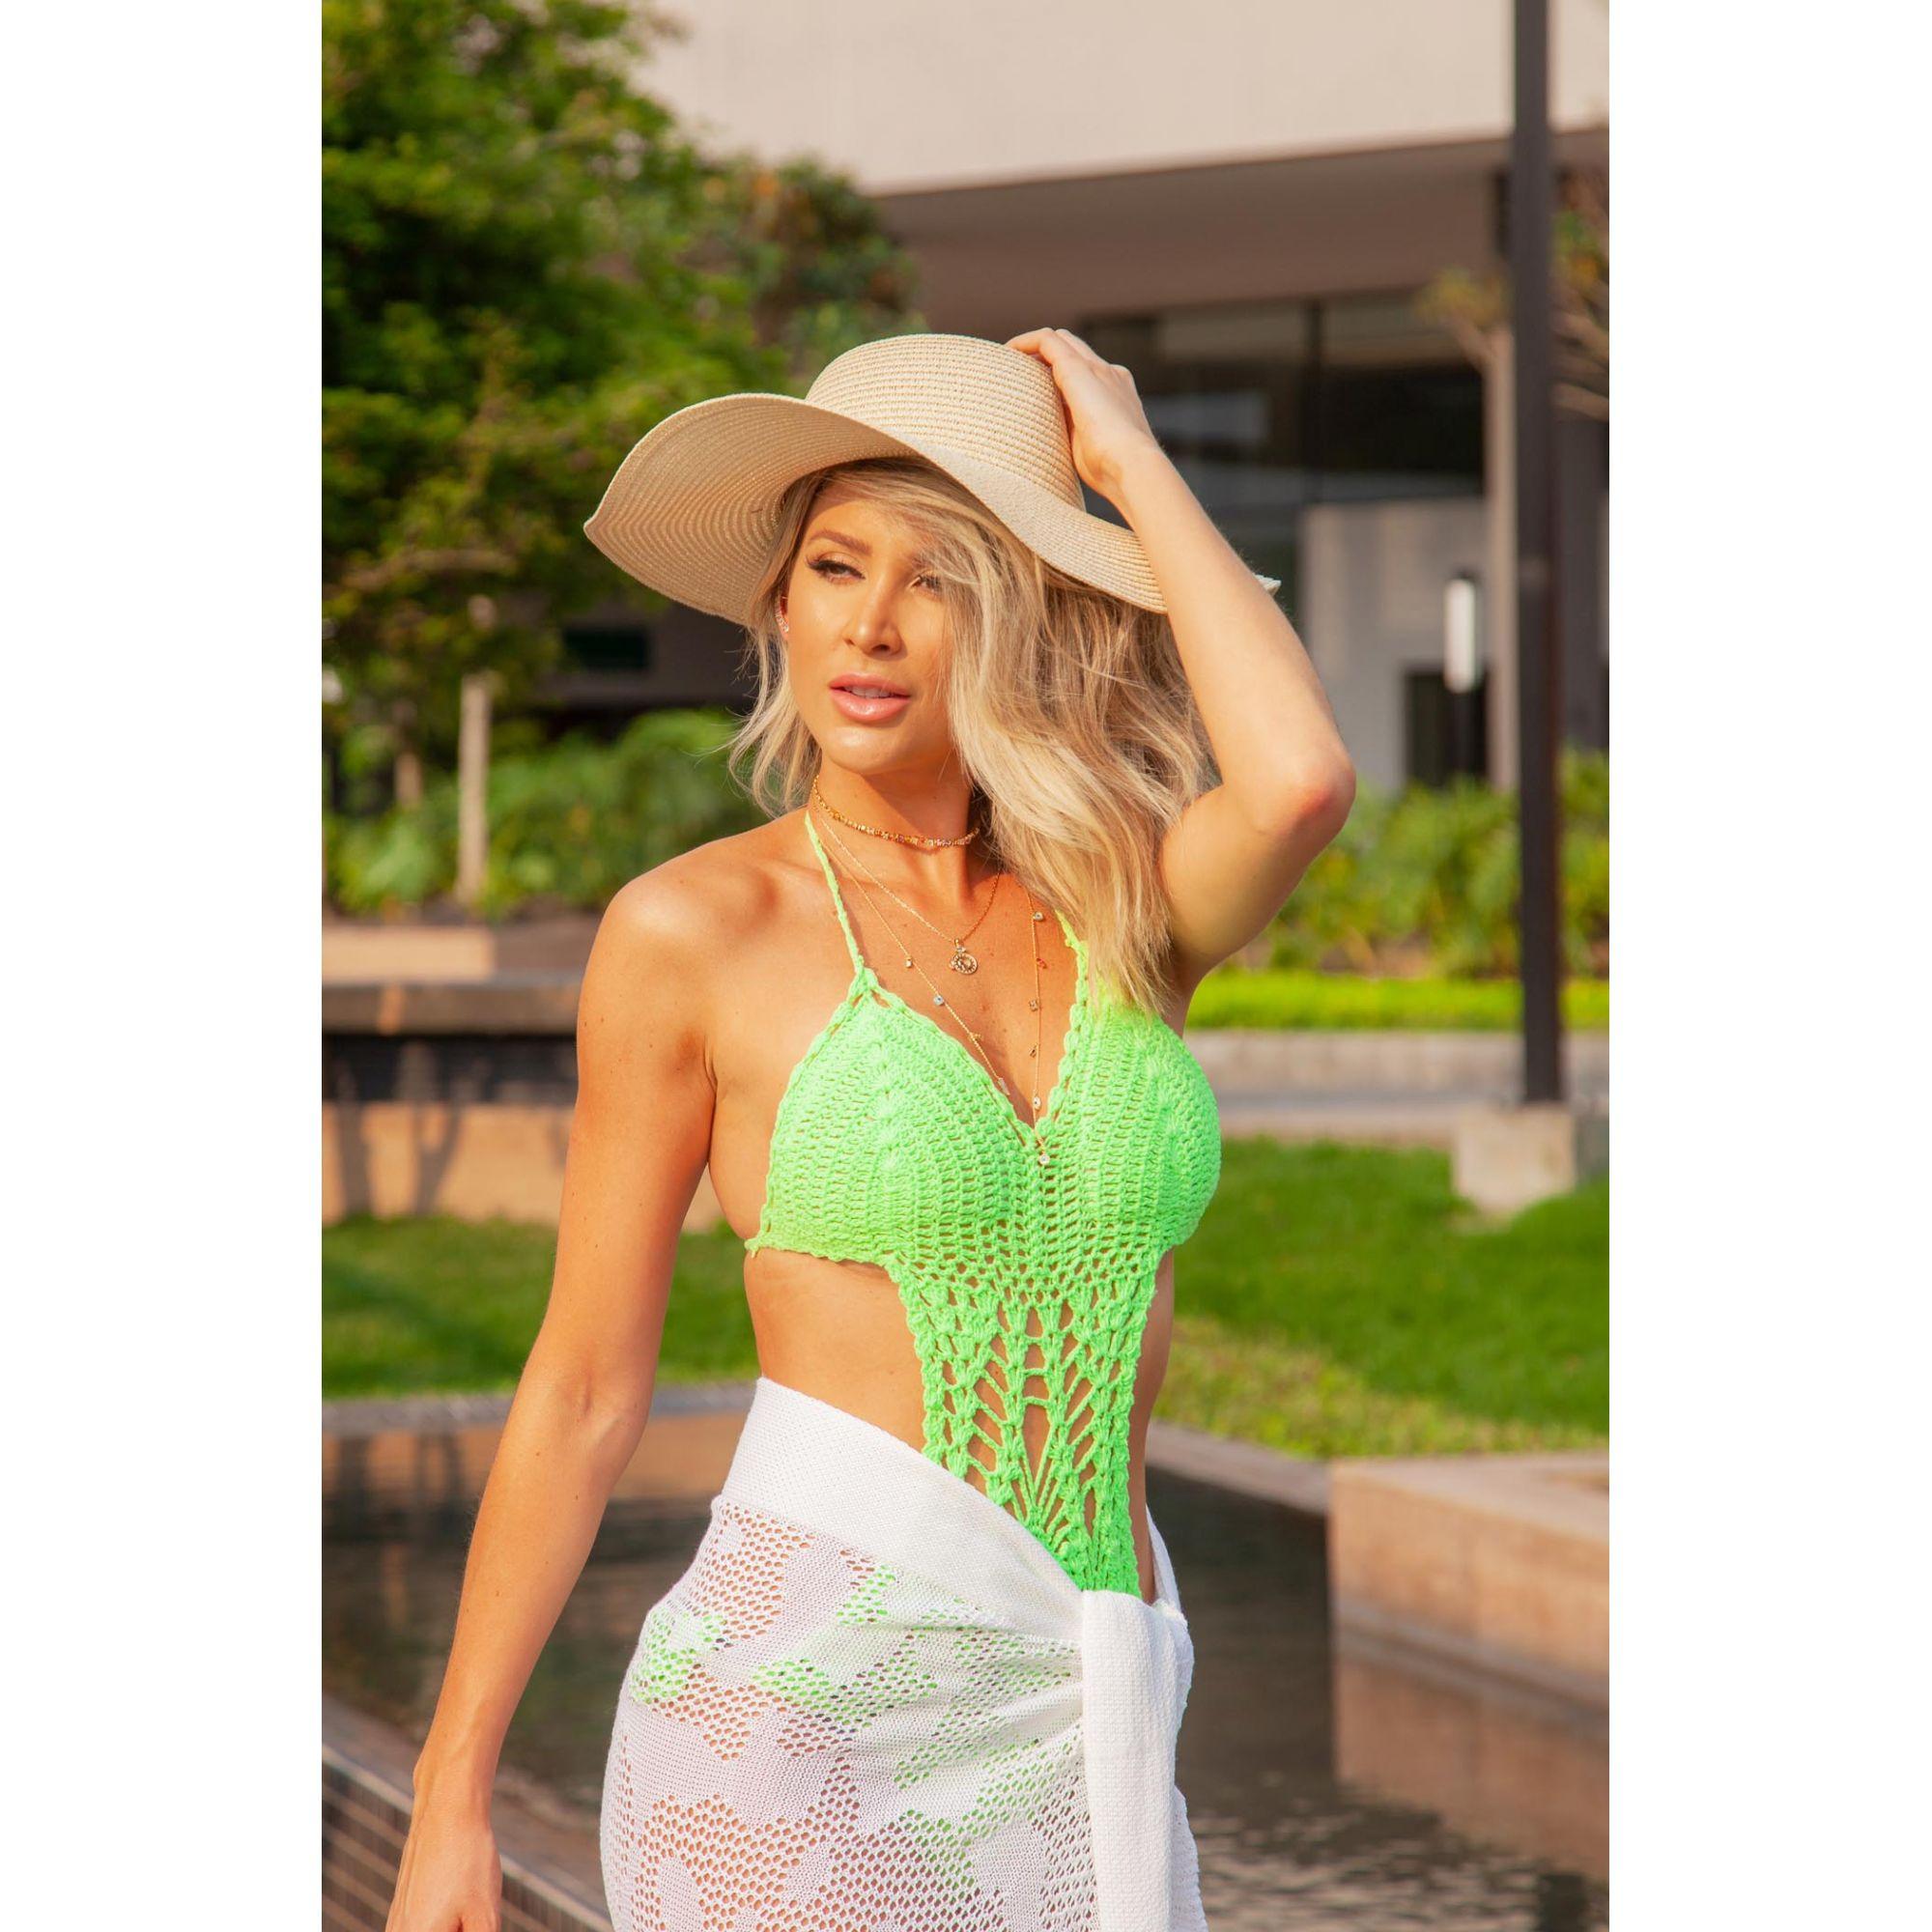 Maiô Vera Tricot Rendado Crochê Bojo Feminino Verde Neon